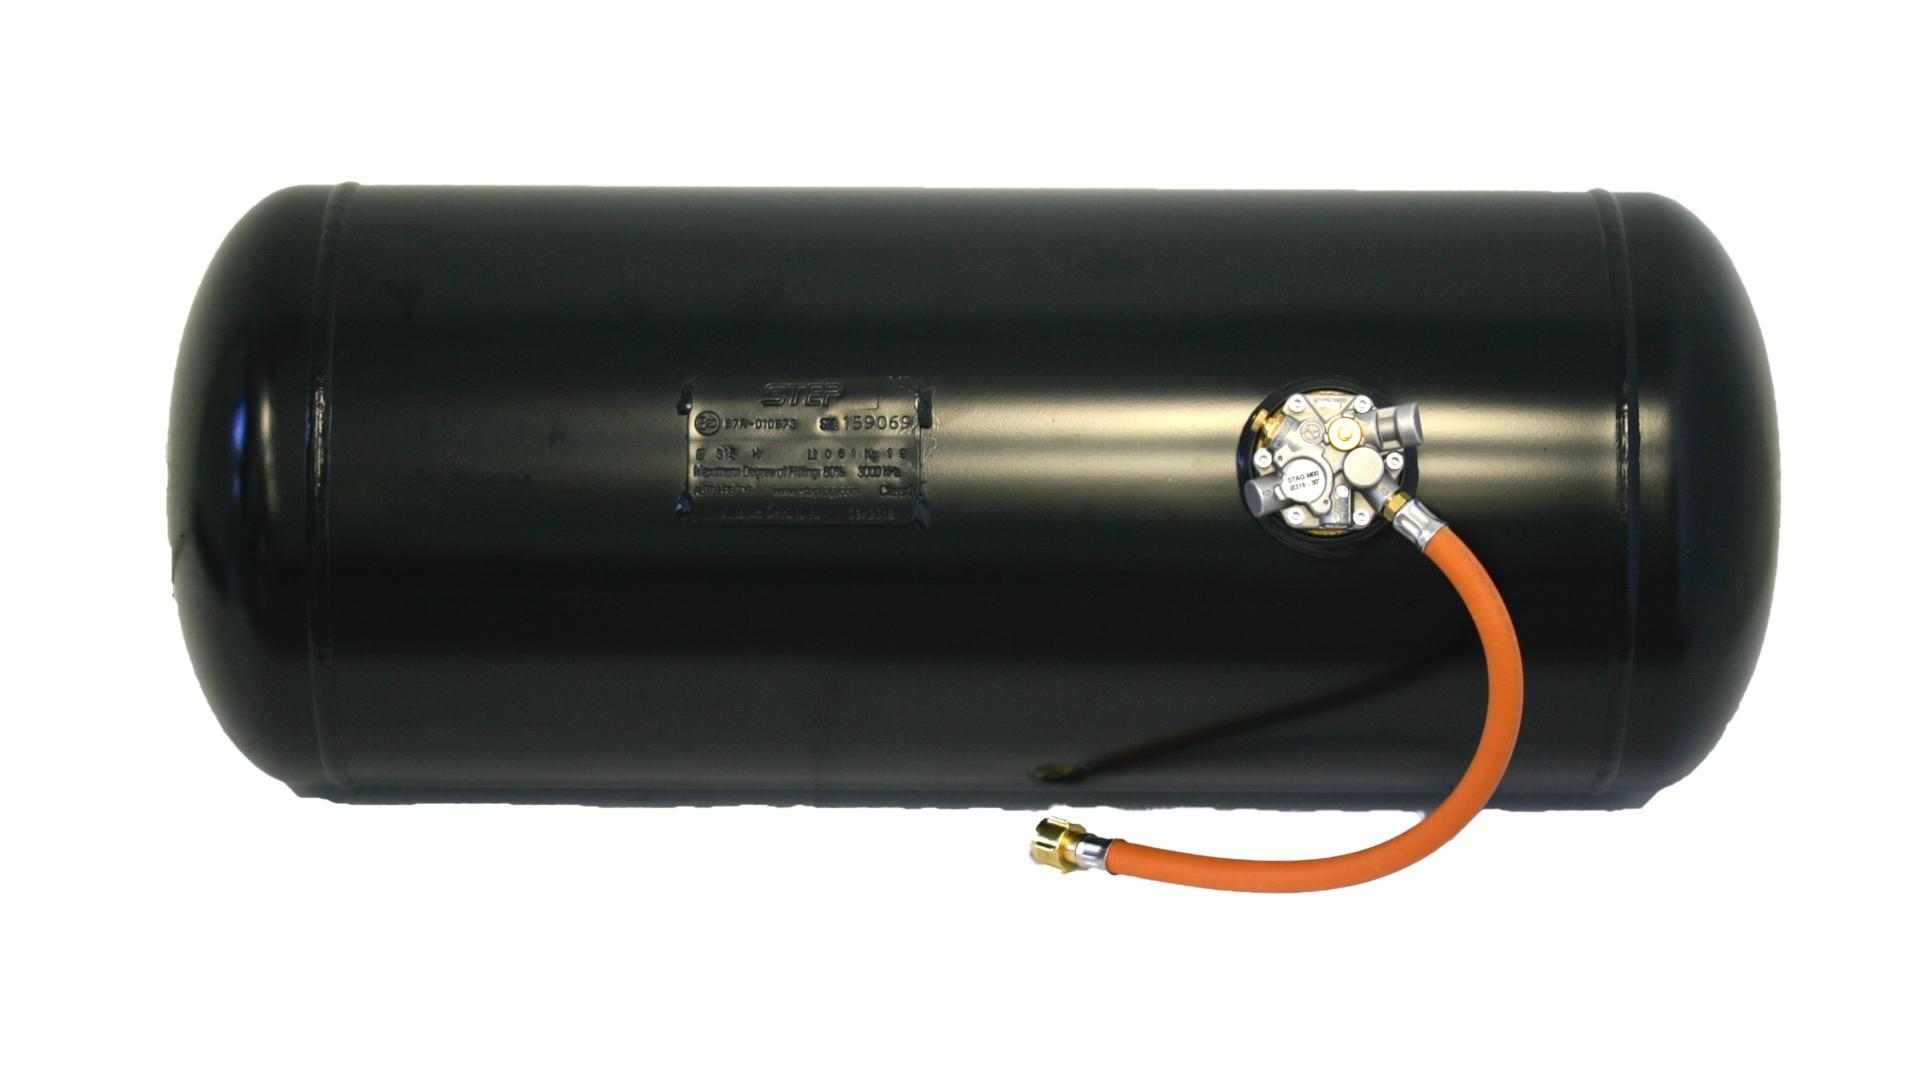 Multiventil-Brenngas-Zylindertank